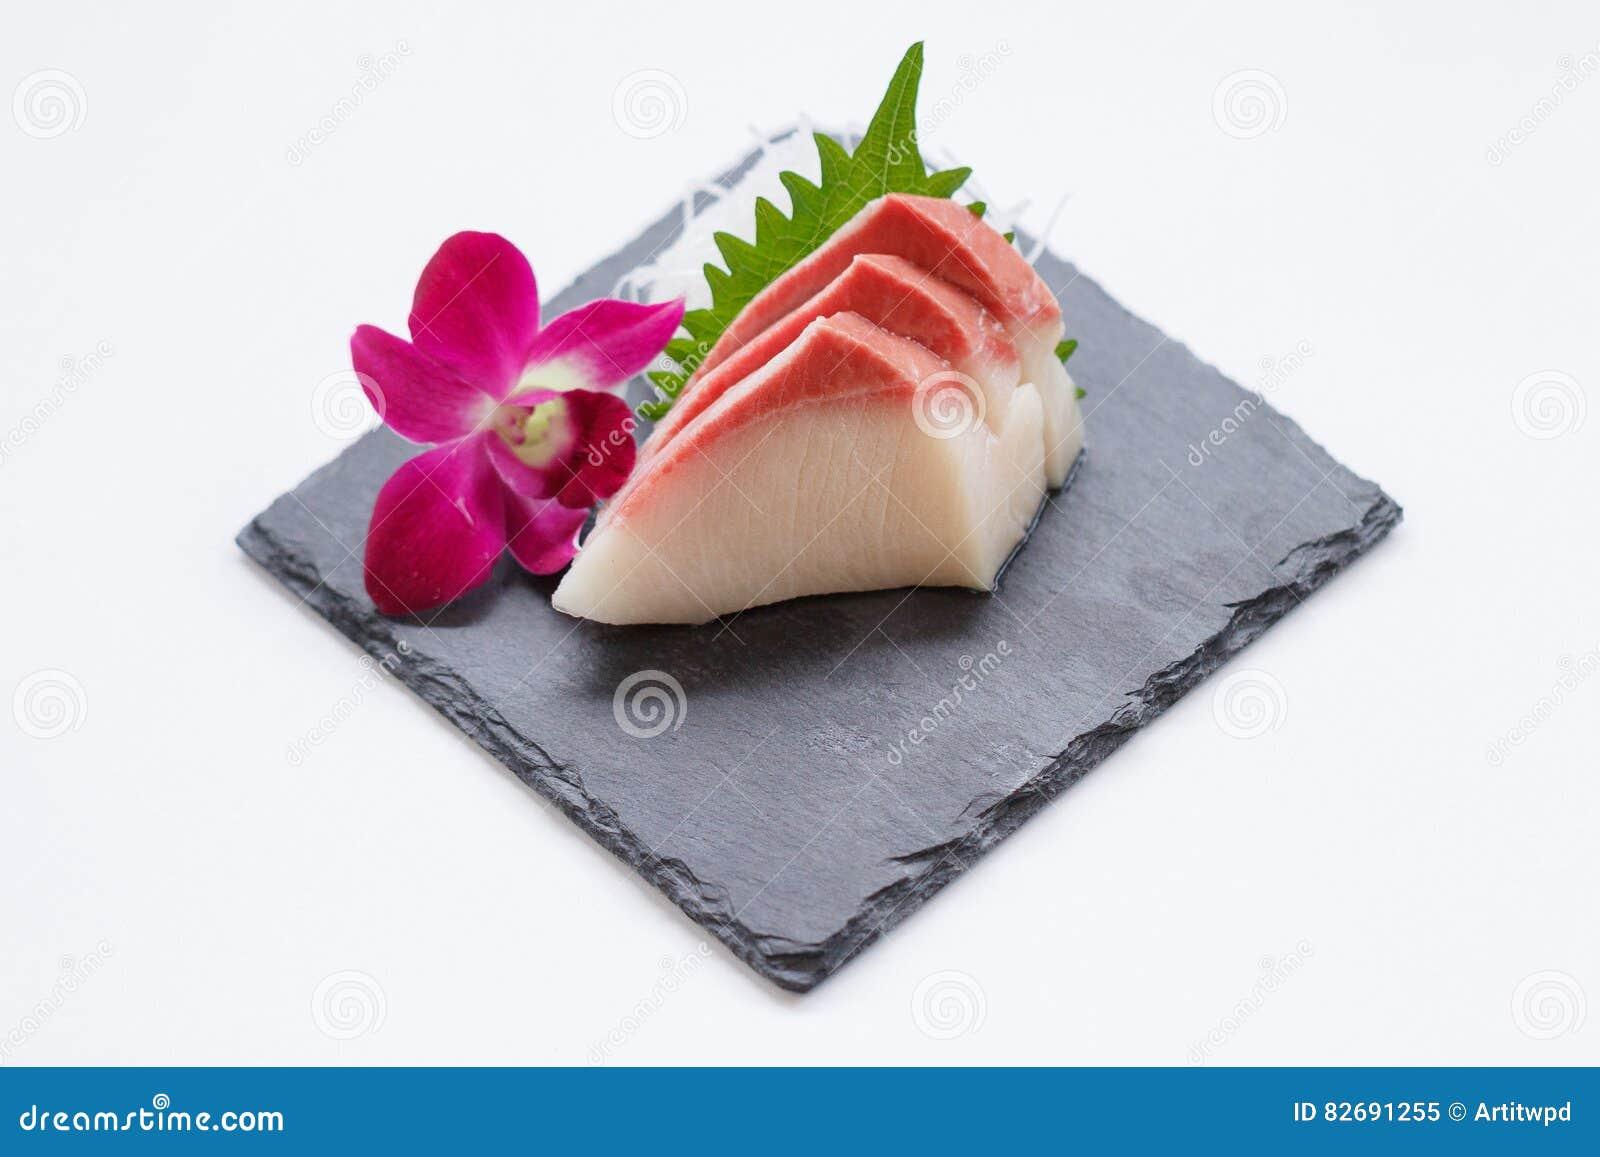 Hamachi Sashimi : Sliced Raw Hamachi Yellowtail Fish Served With